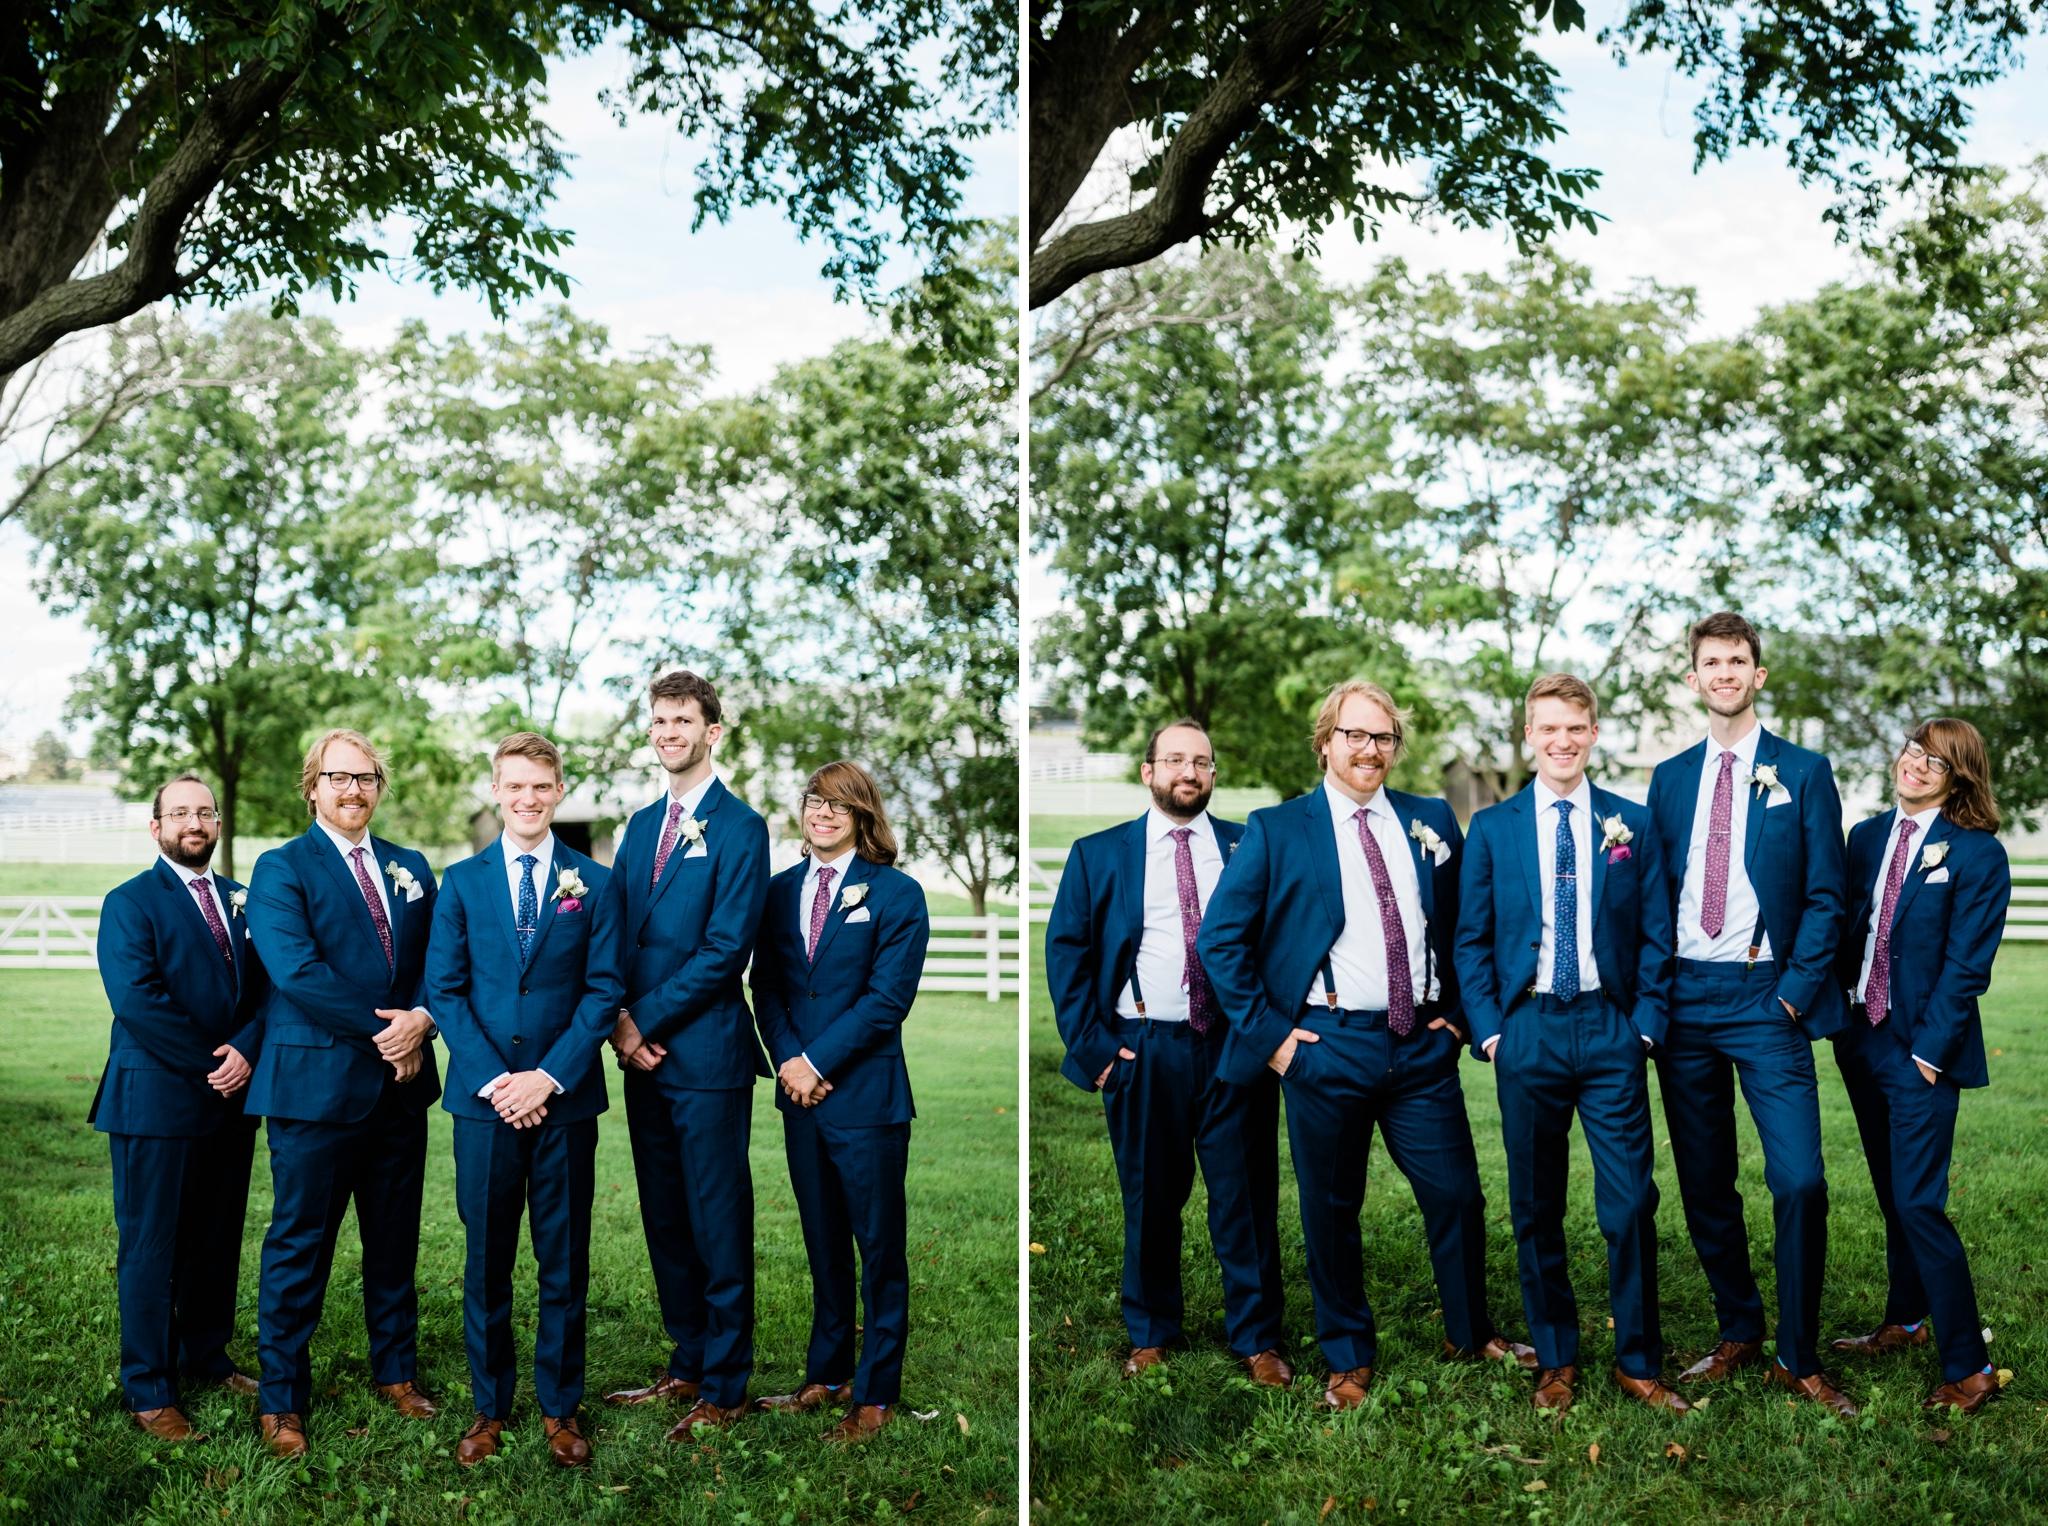 Emily Grace Photography, Lancaster PA Wedding Photographer, Wedding Photography for Unique Couples, The Barn at Silverstone, Lancaster PA Wedding Venue, The Barn at Silverstone Groomsmen Photos